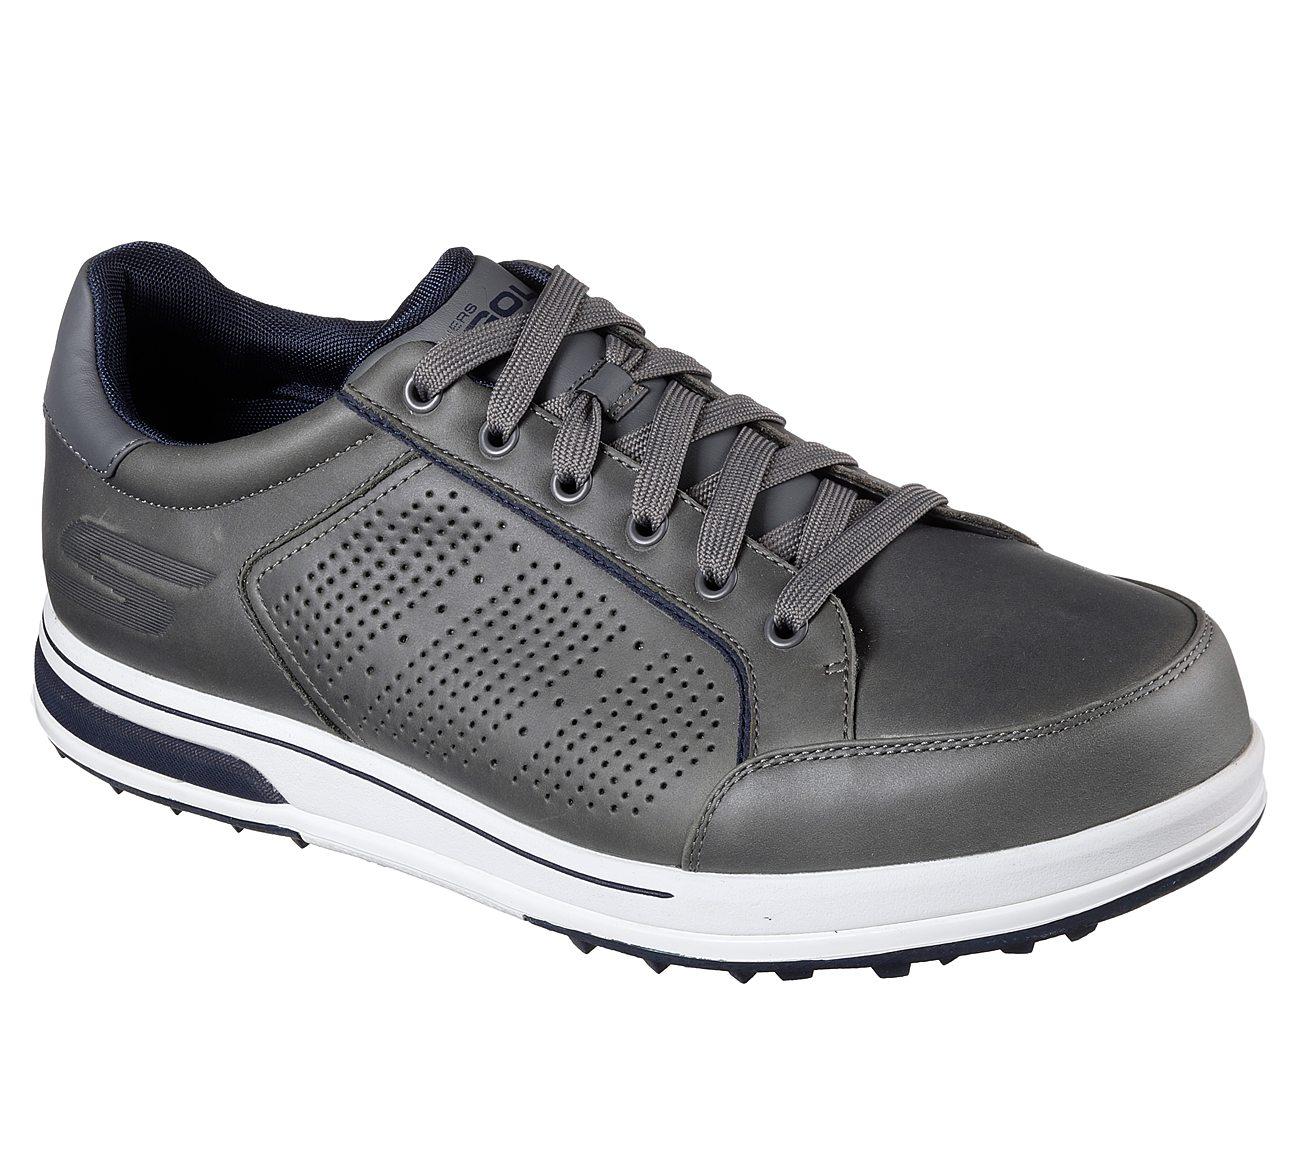 Buy Skechers Skechers Go Golf Drive 2 Lx Skechers Go Golf